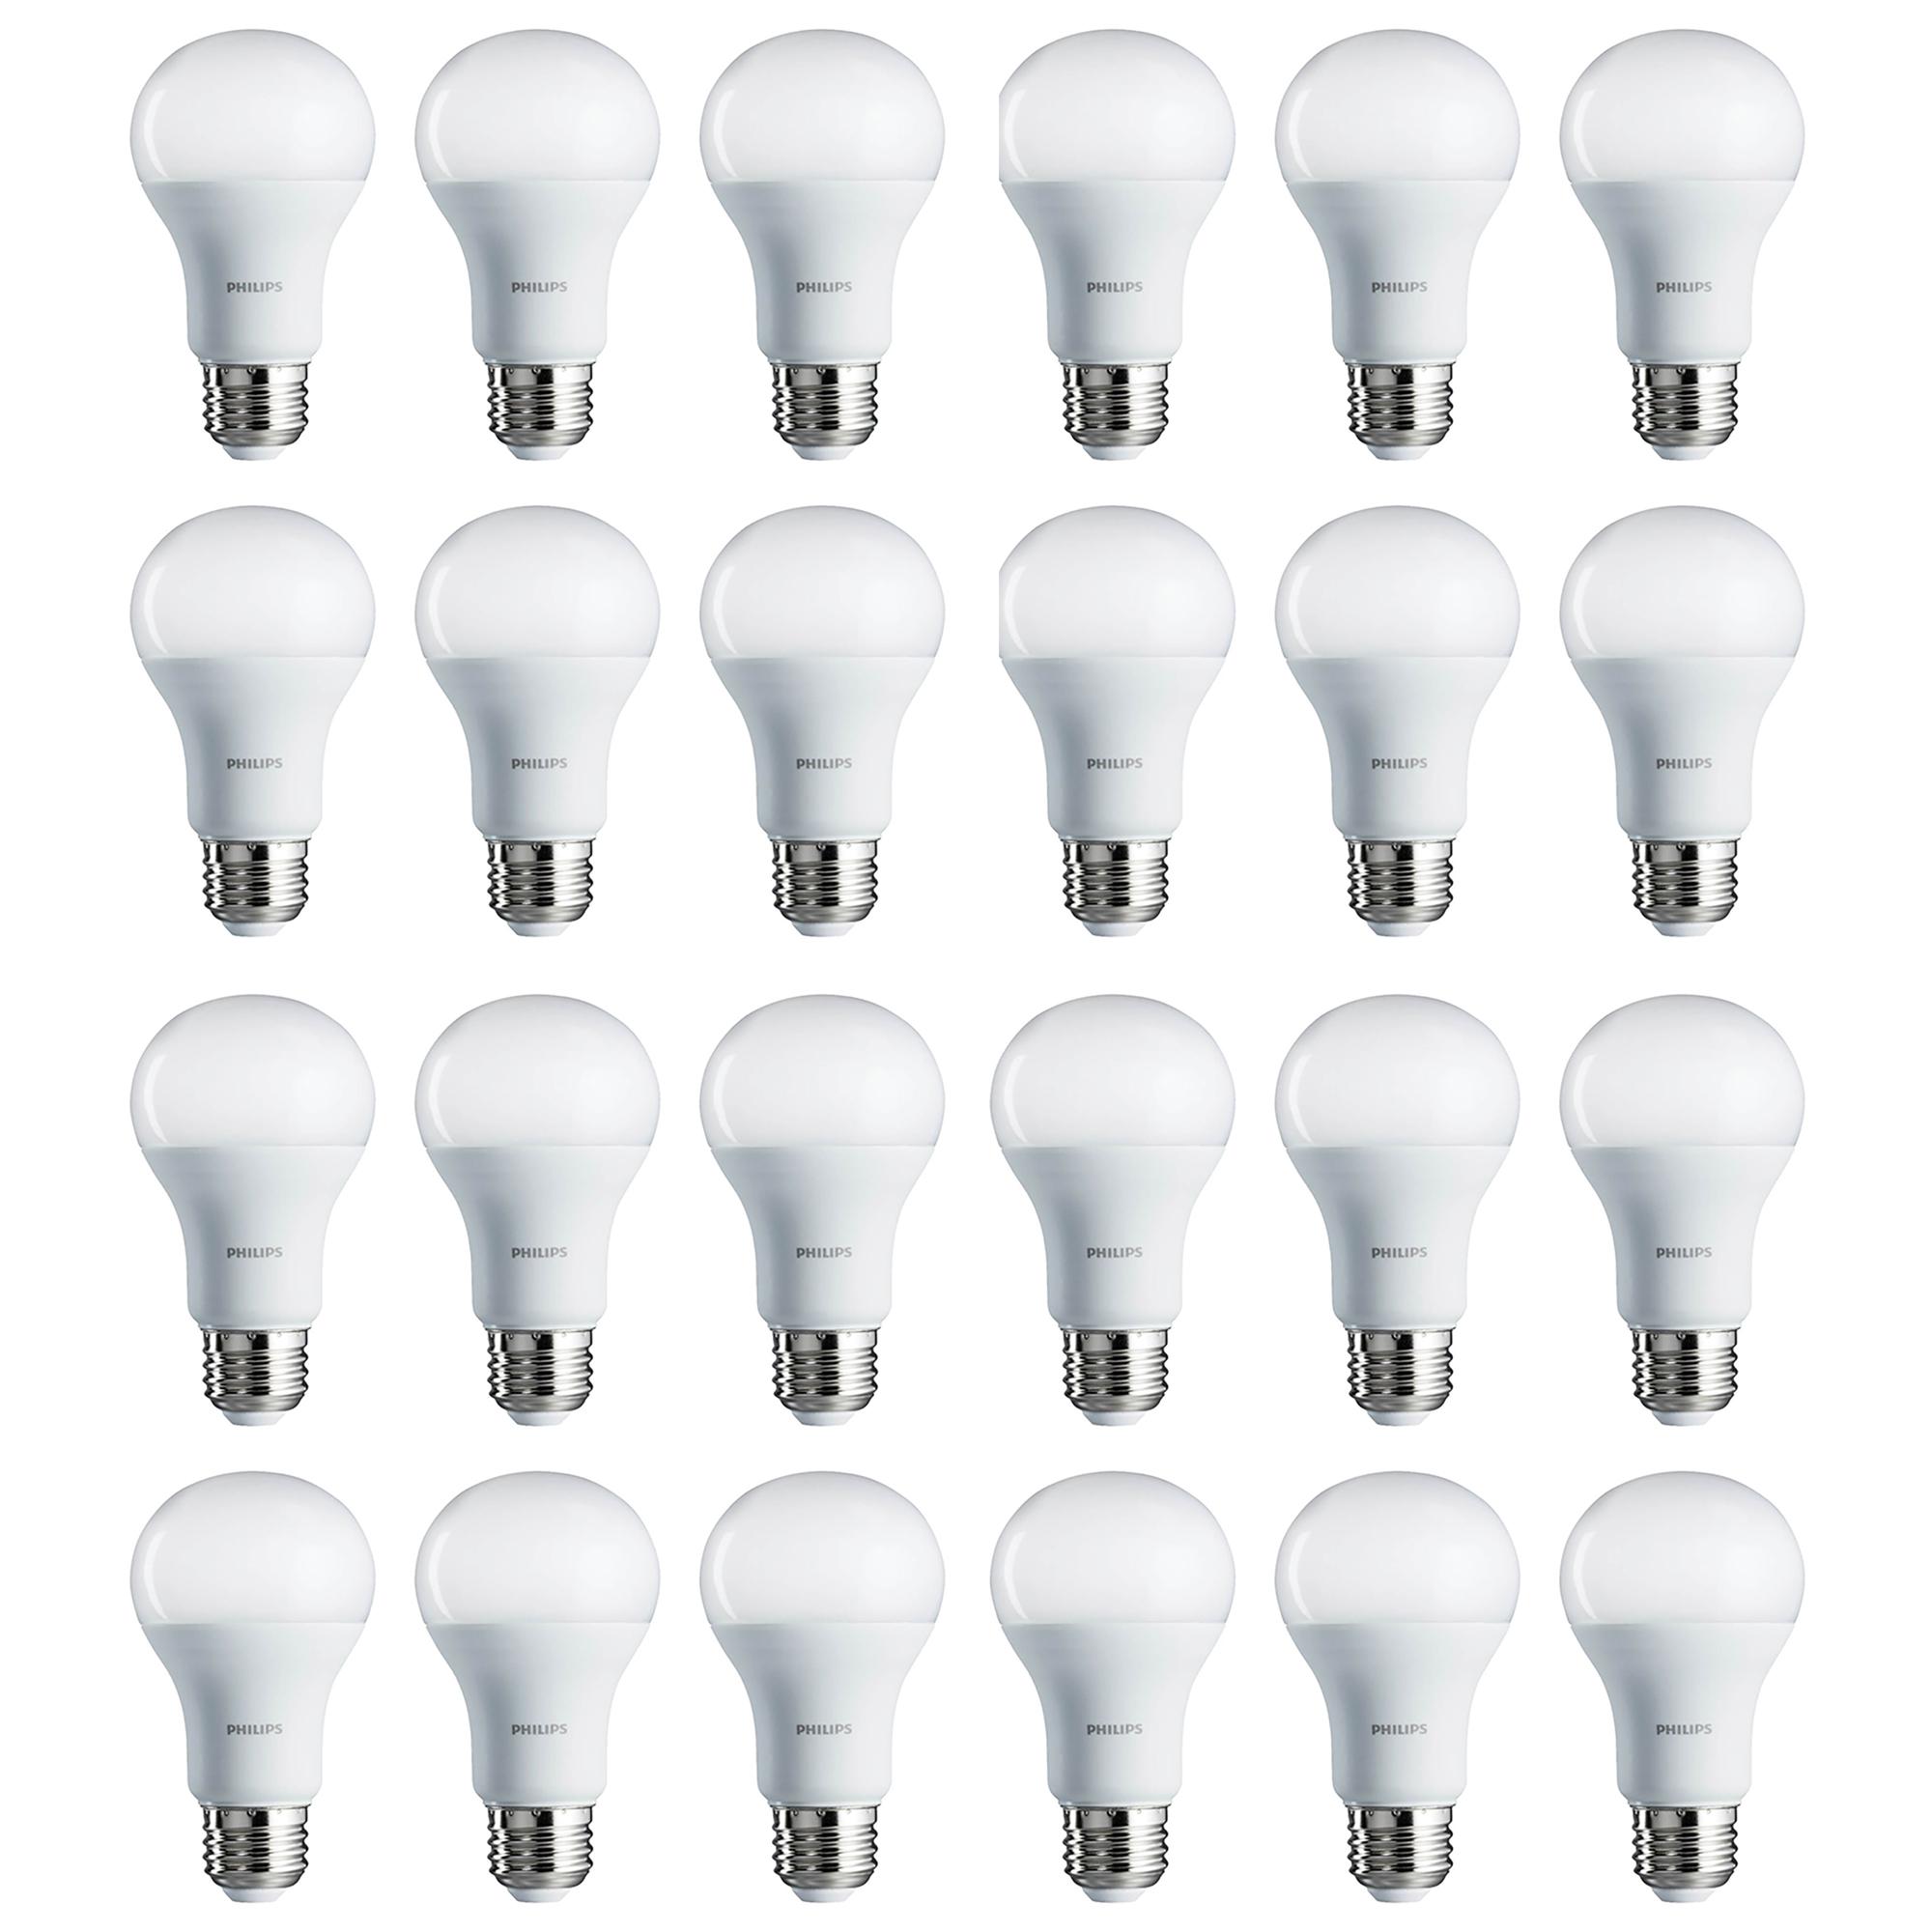 bulb sparkfun lighting bulbs comparison leds to light led and exposed philips news electronics the bottom dfm race